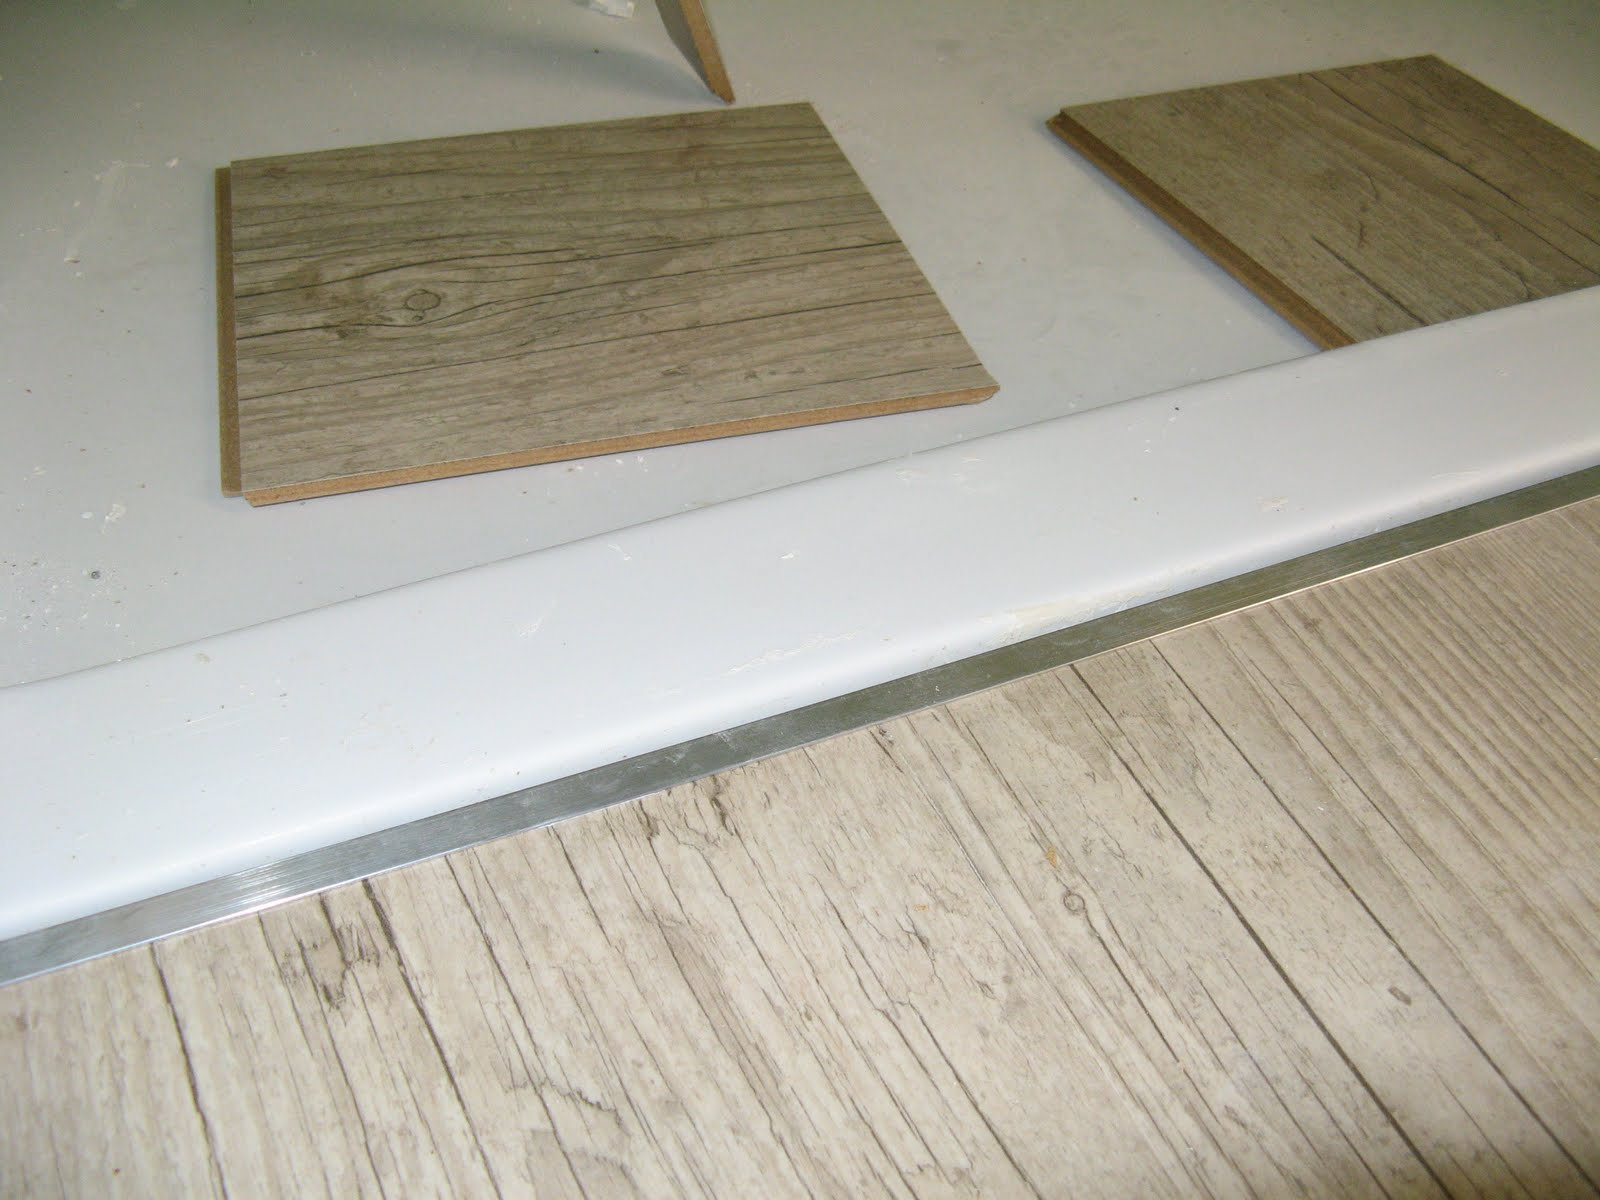 carrelage design baguette de finition carrelage moderne design pour carrelage de sol et. Black Bedroom Furniture Sets. Home Design Ideas